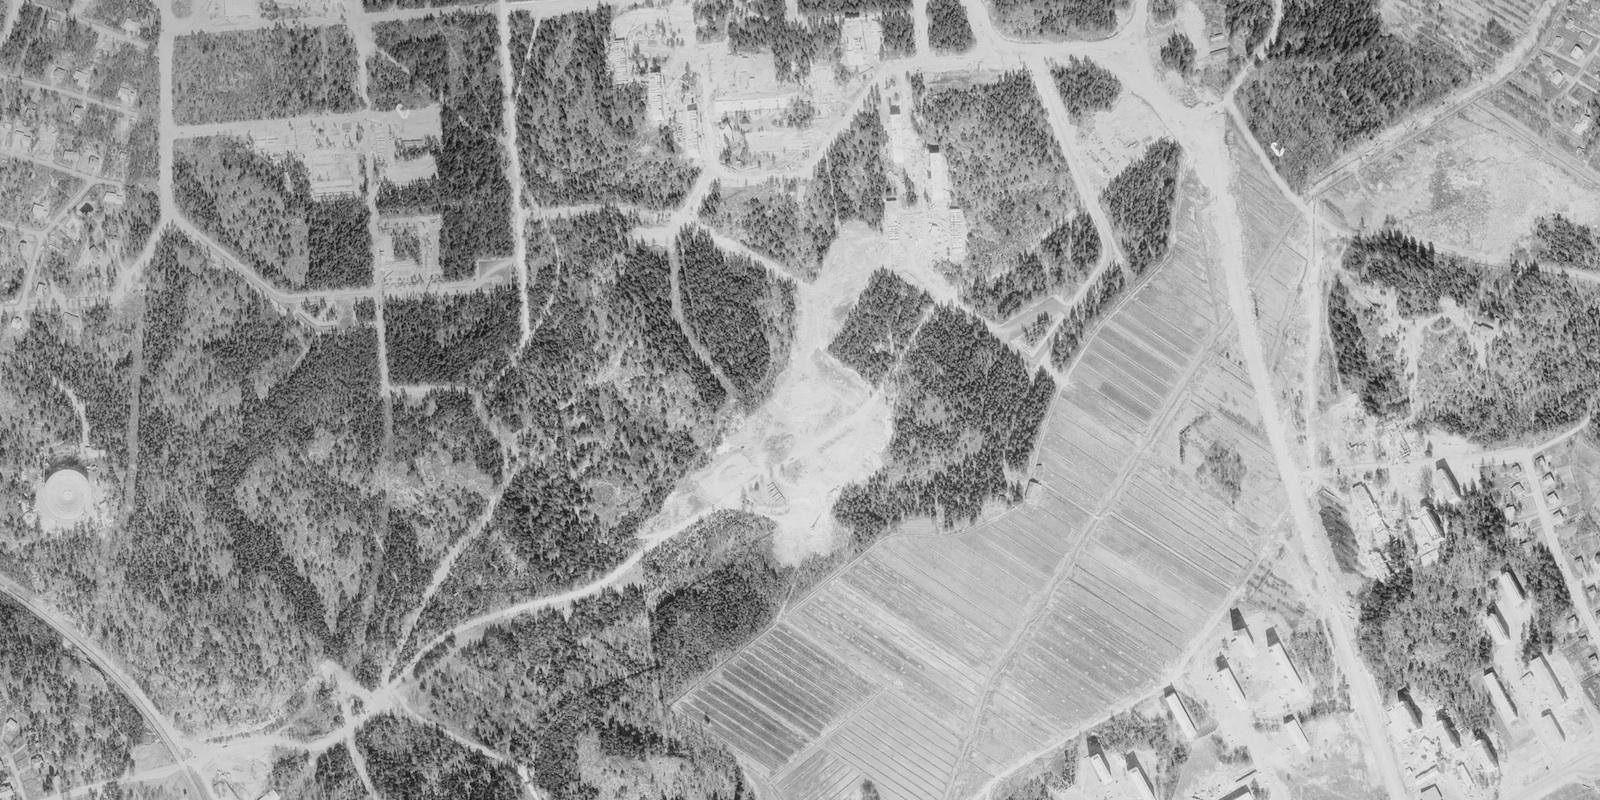 Toukokuu 1964